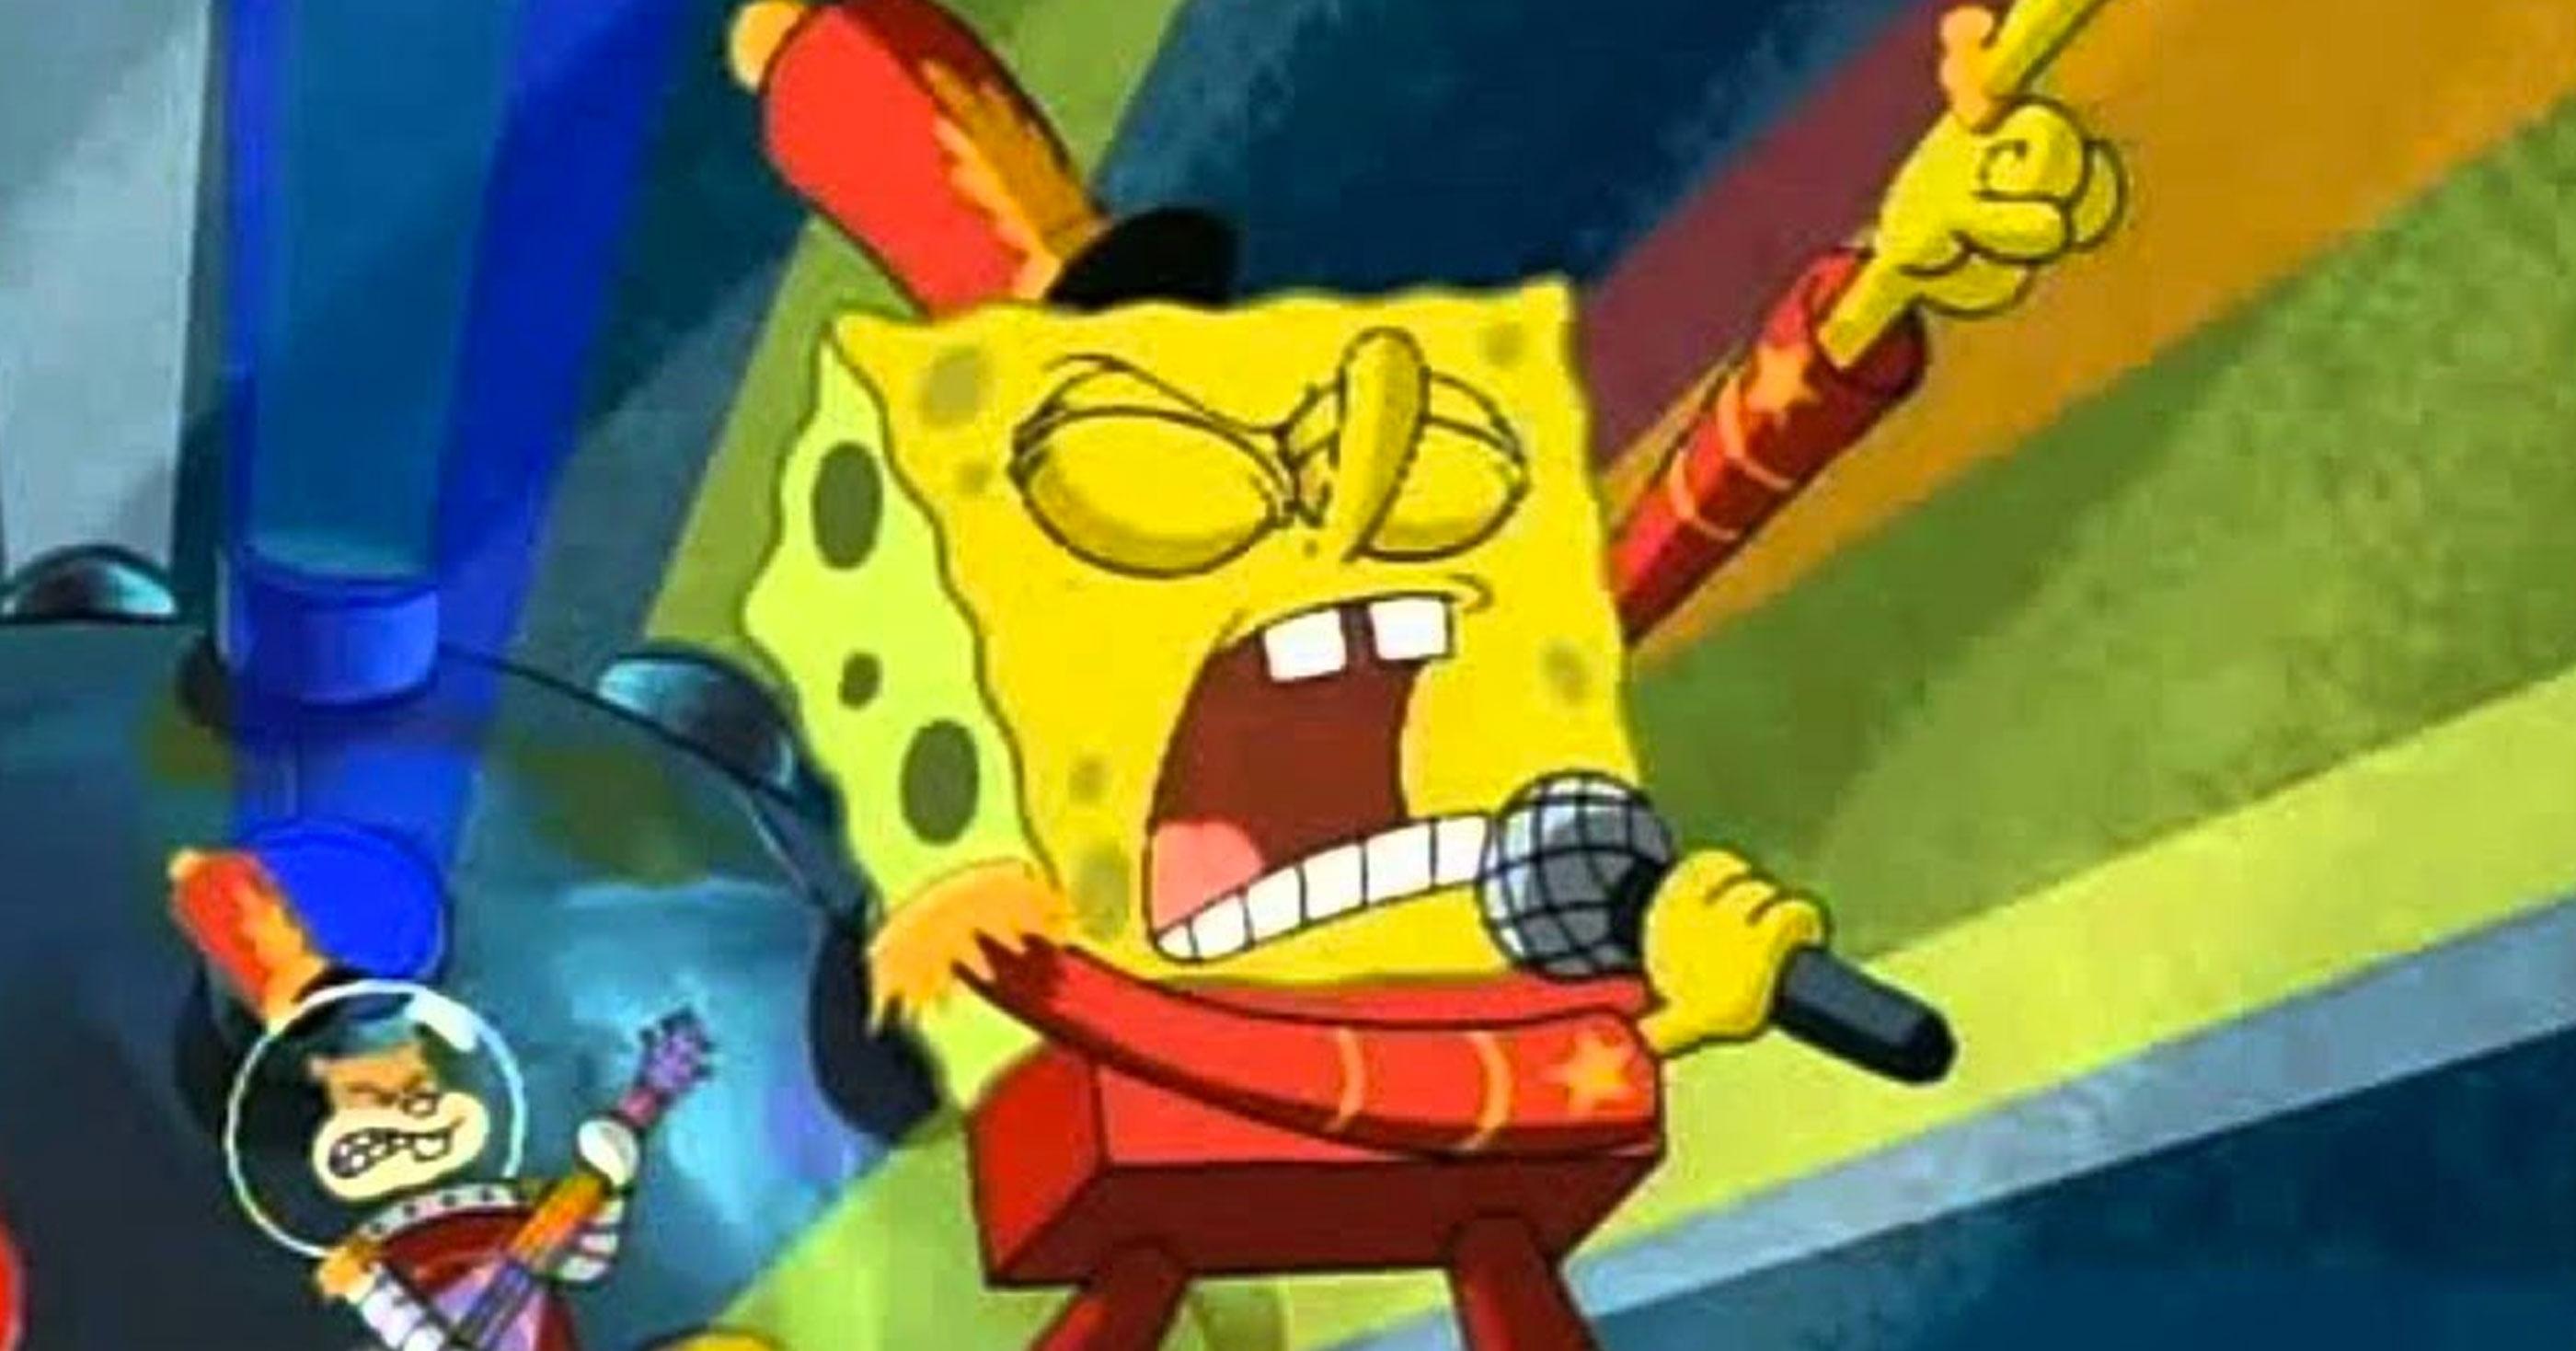 Petition For Spongebob's 'sweet Victory' To Be Super Bowl 53 regarding Spongebob Squarepants Sweet Victory